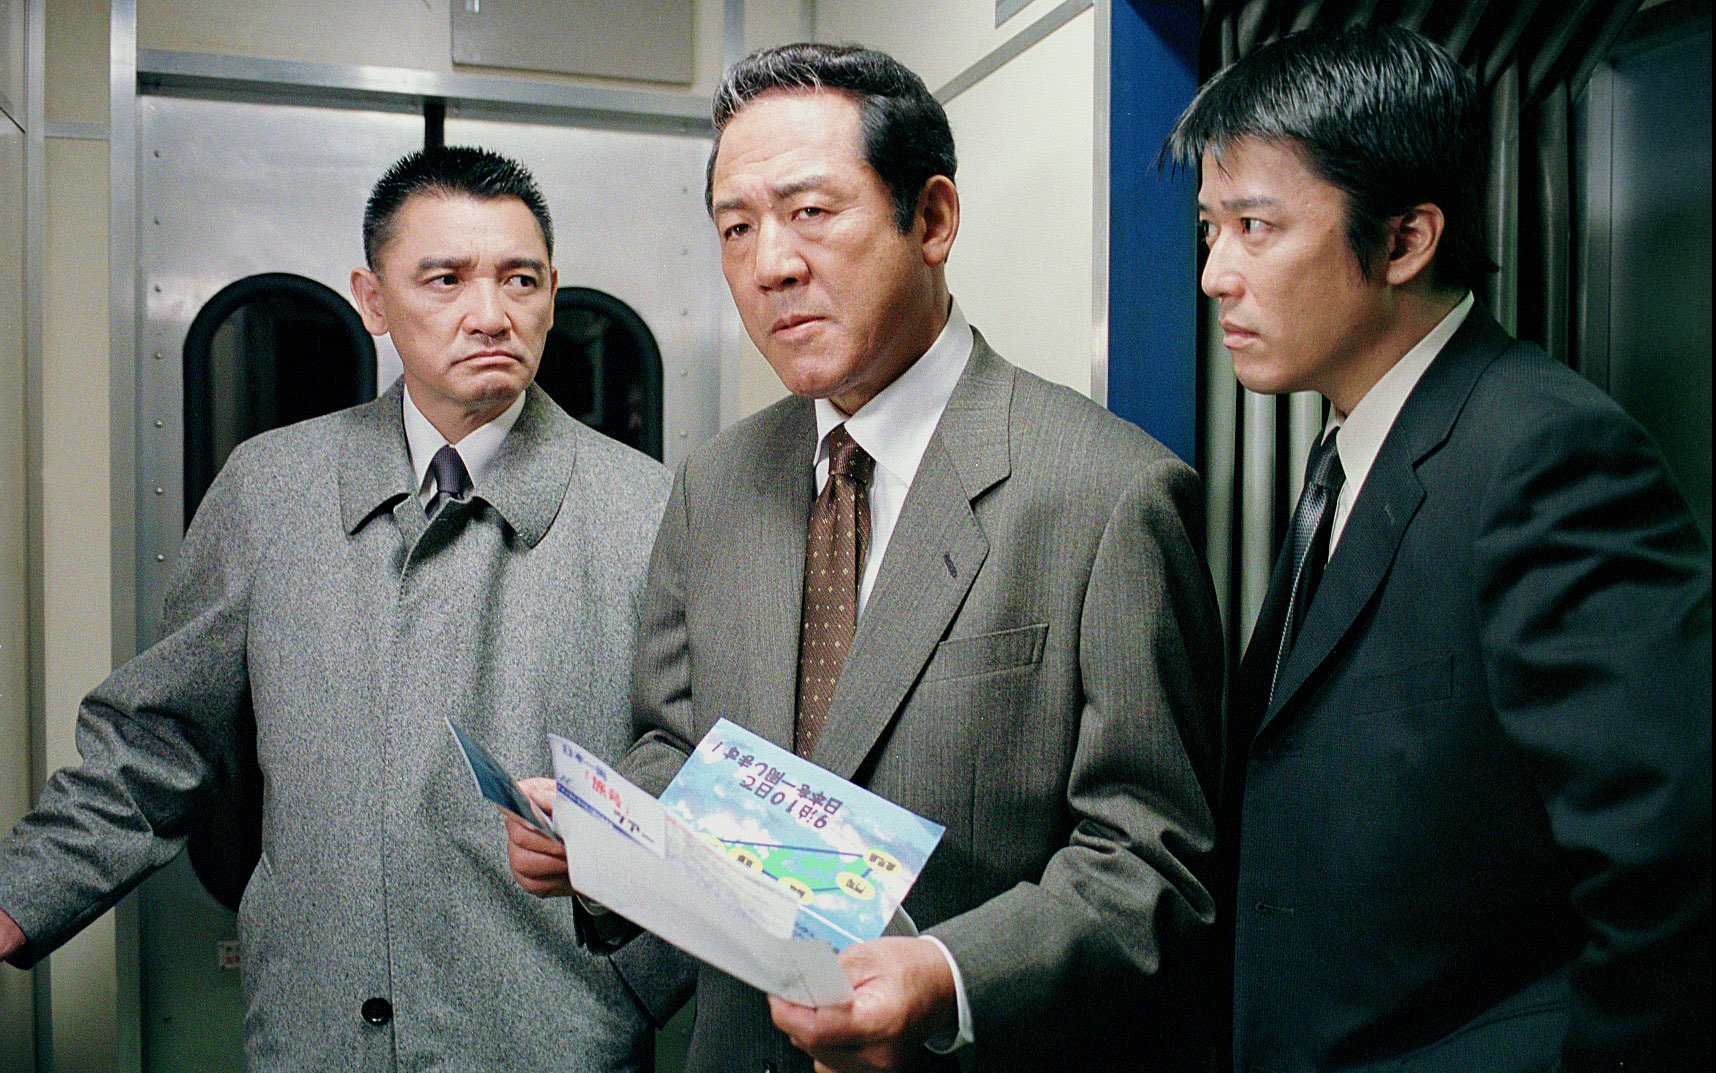 『西村京太郎サスペンス 日本一周「旅号」殺人事件』